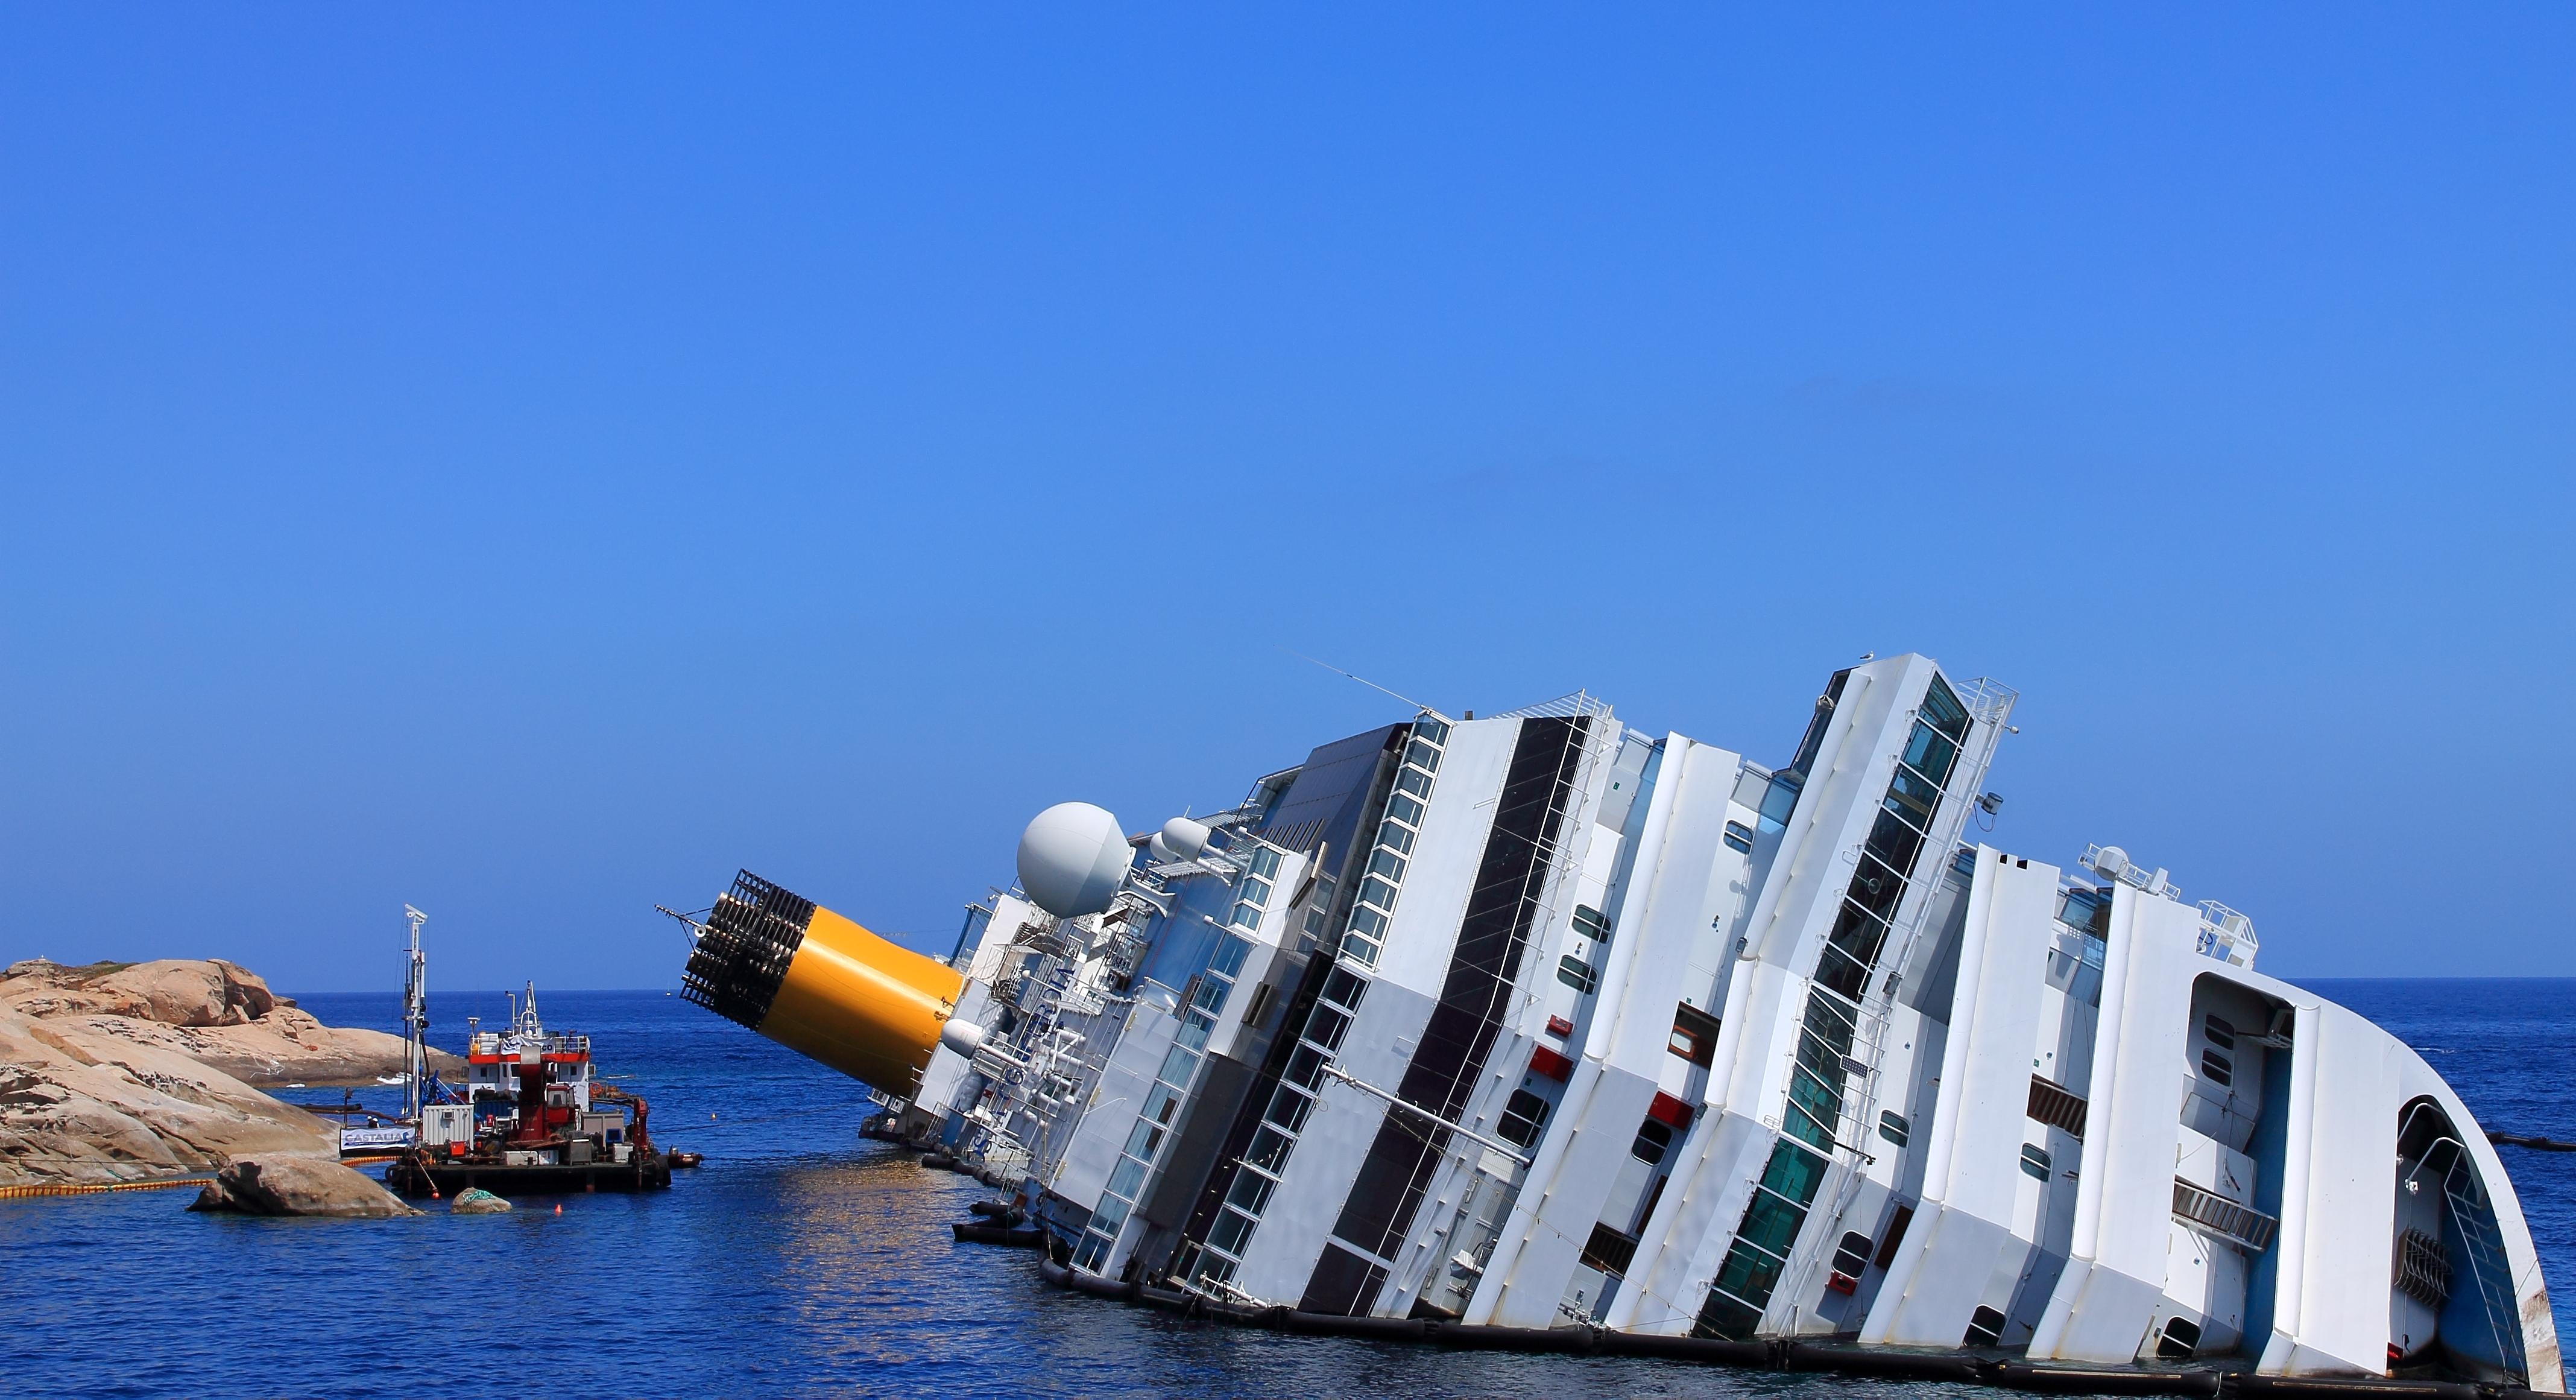 FileSunken Cruise ShipJPG Wikimedia Commons - Sunken cruise ships